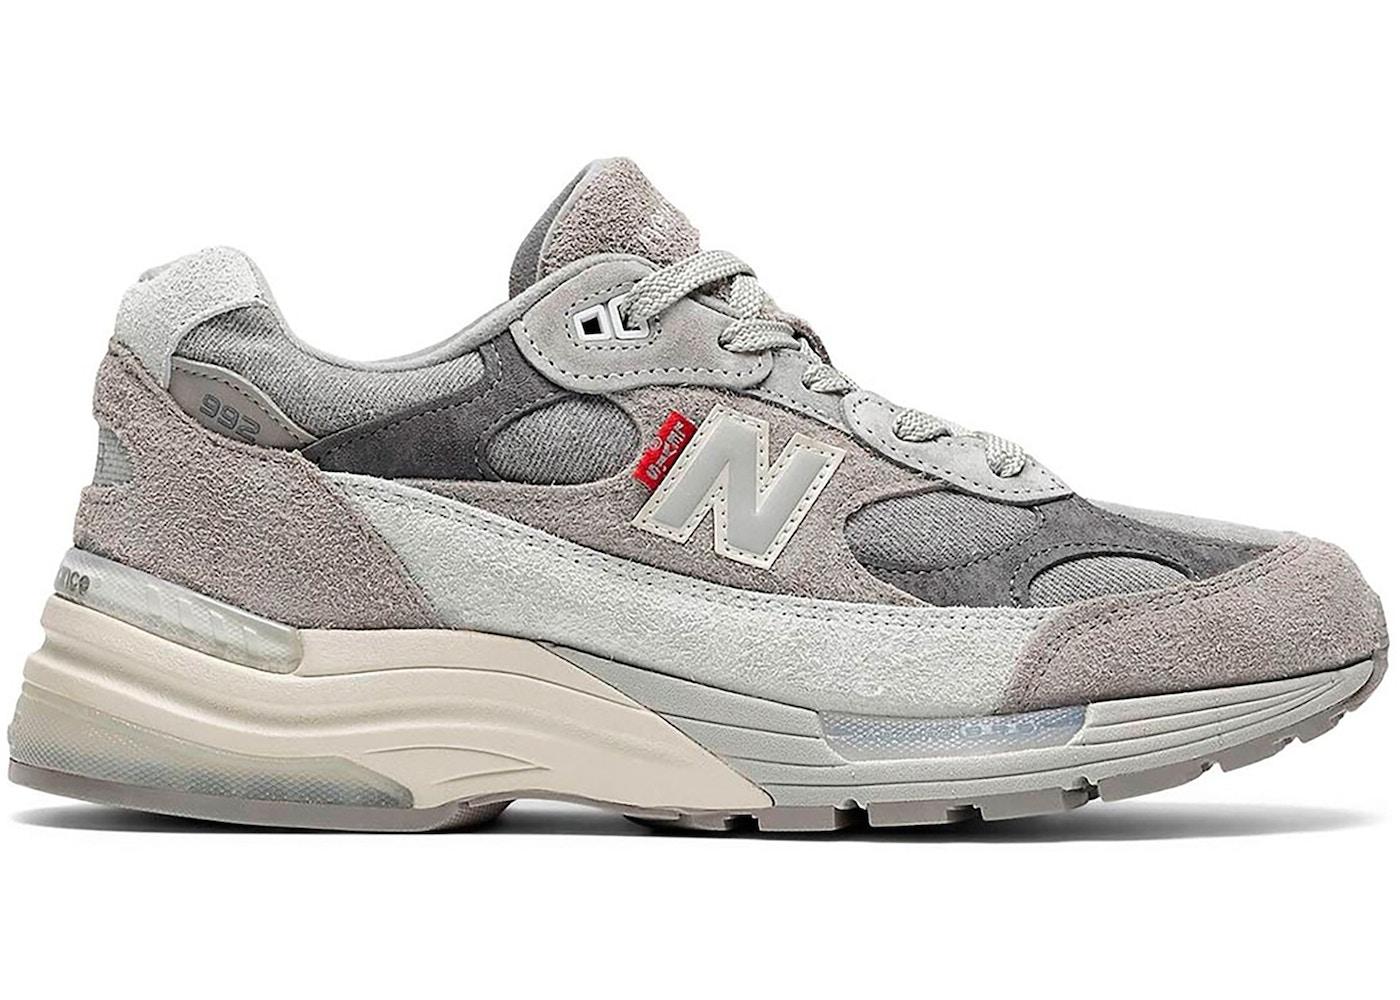 New Balance 992 Levi's Grey